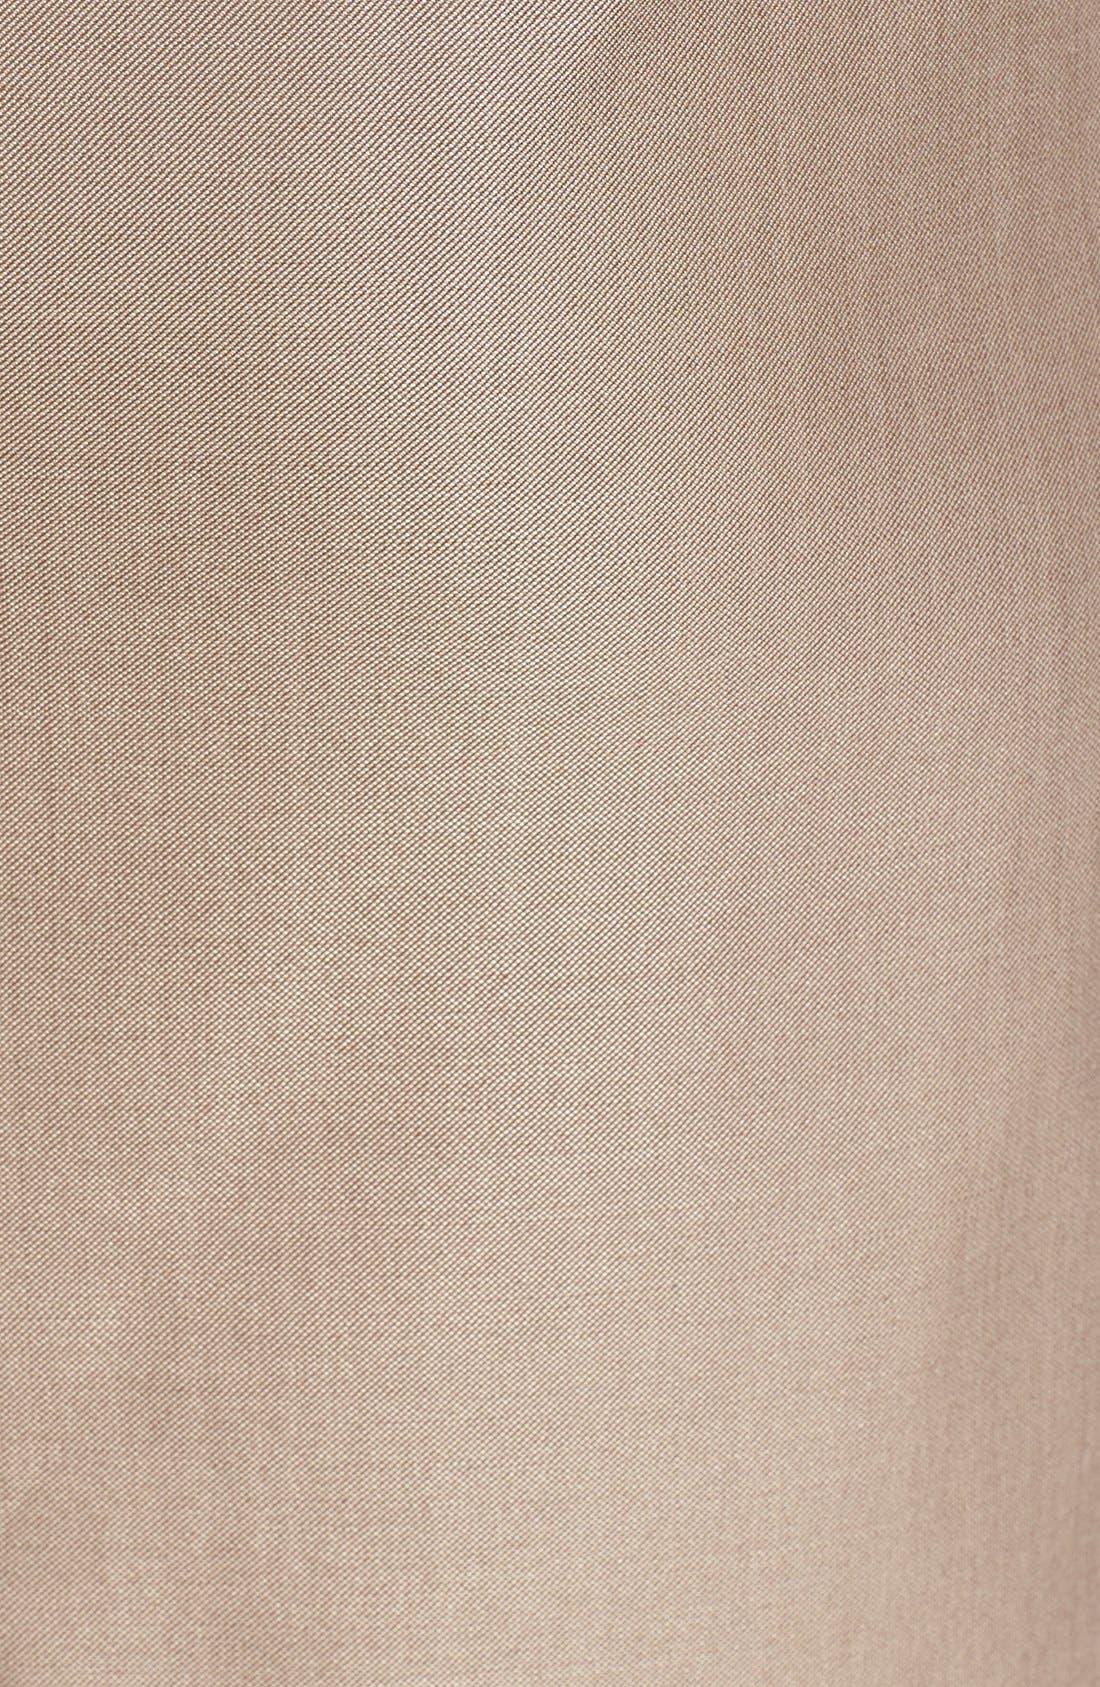 Wool Blend Pencil Skirt,                             Alternate thumbnail 7, color,                             220